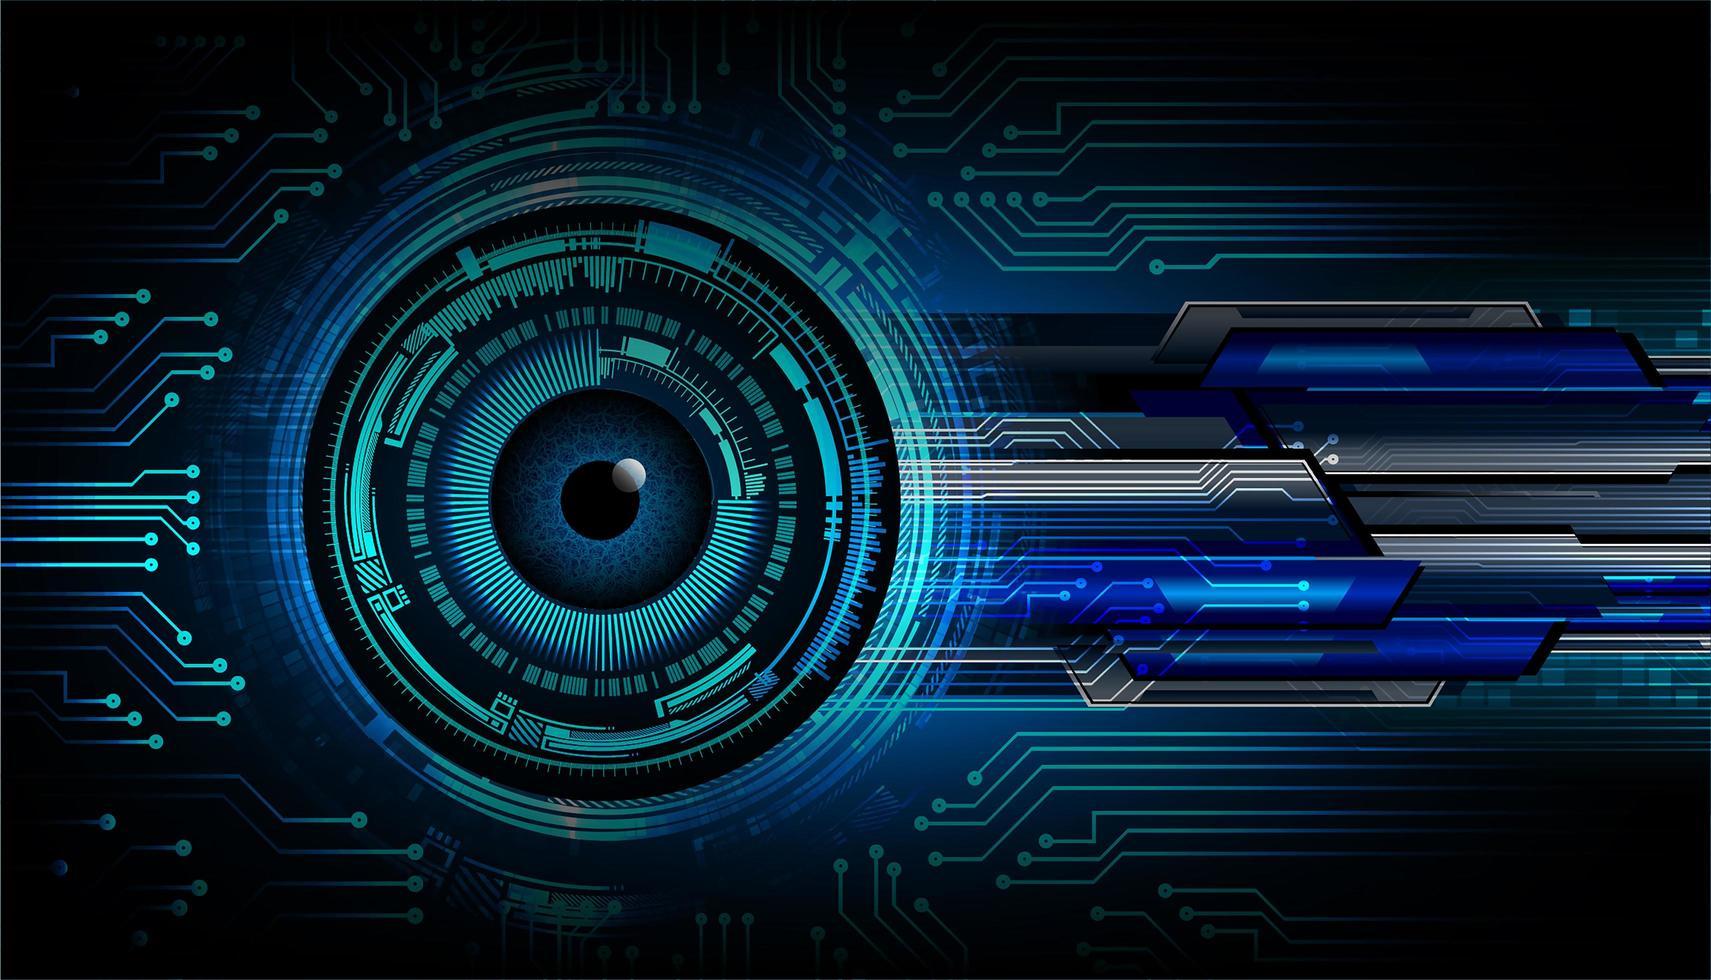 Blue eye cyber circuit future technology concept  vector